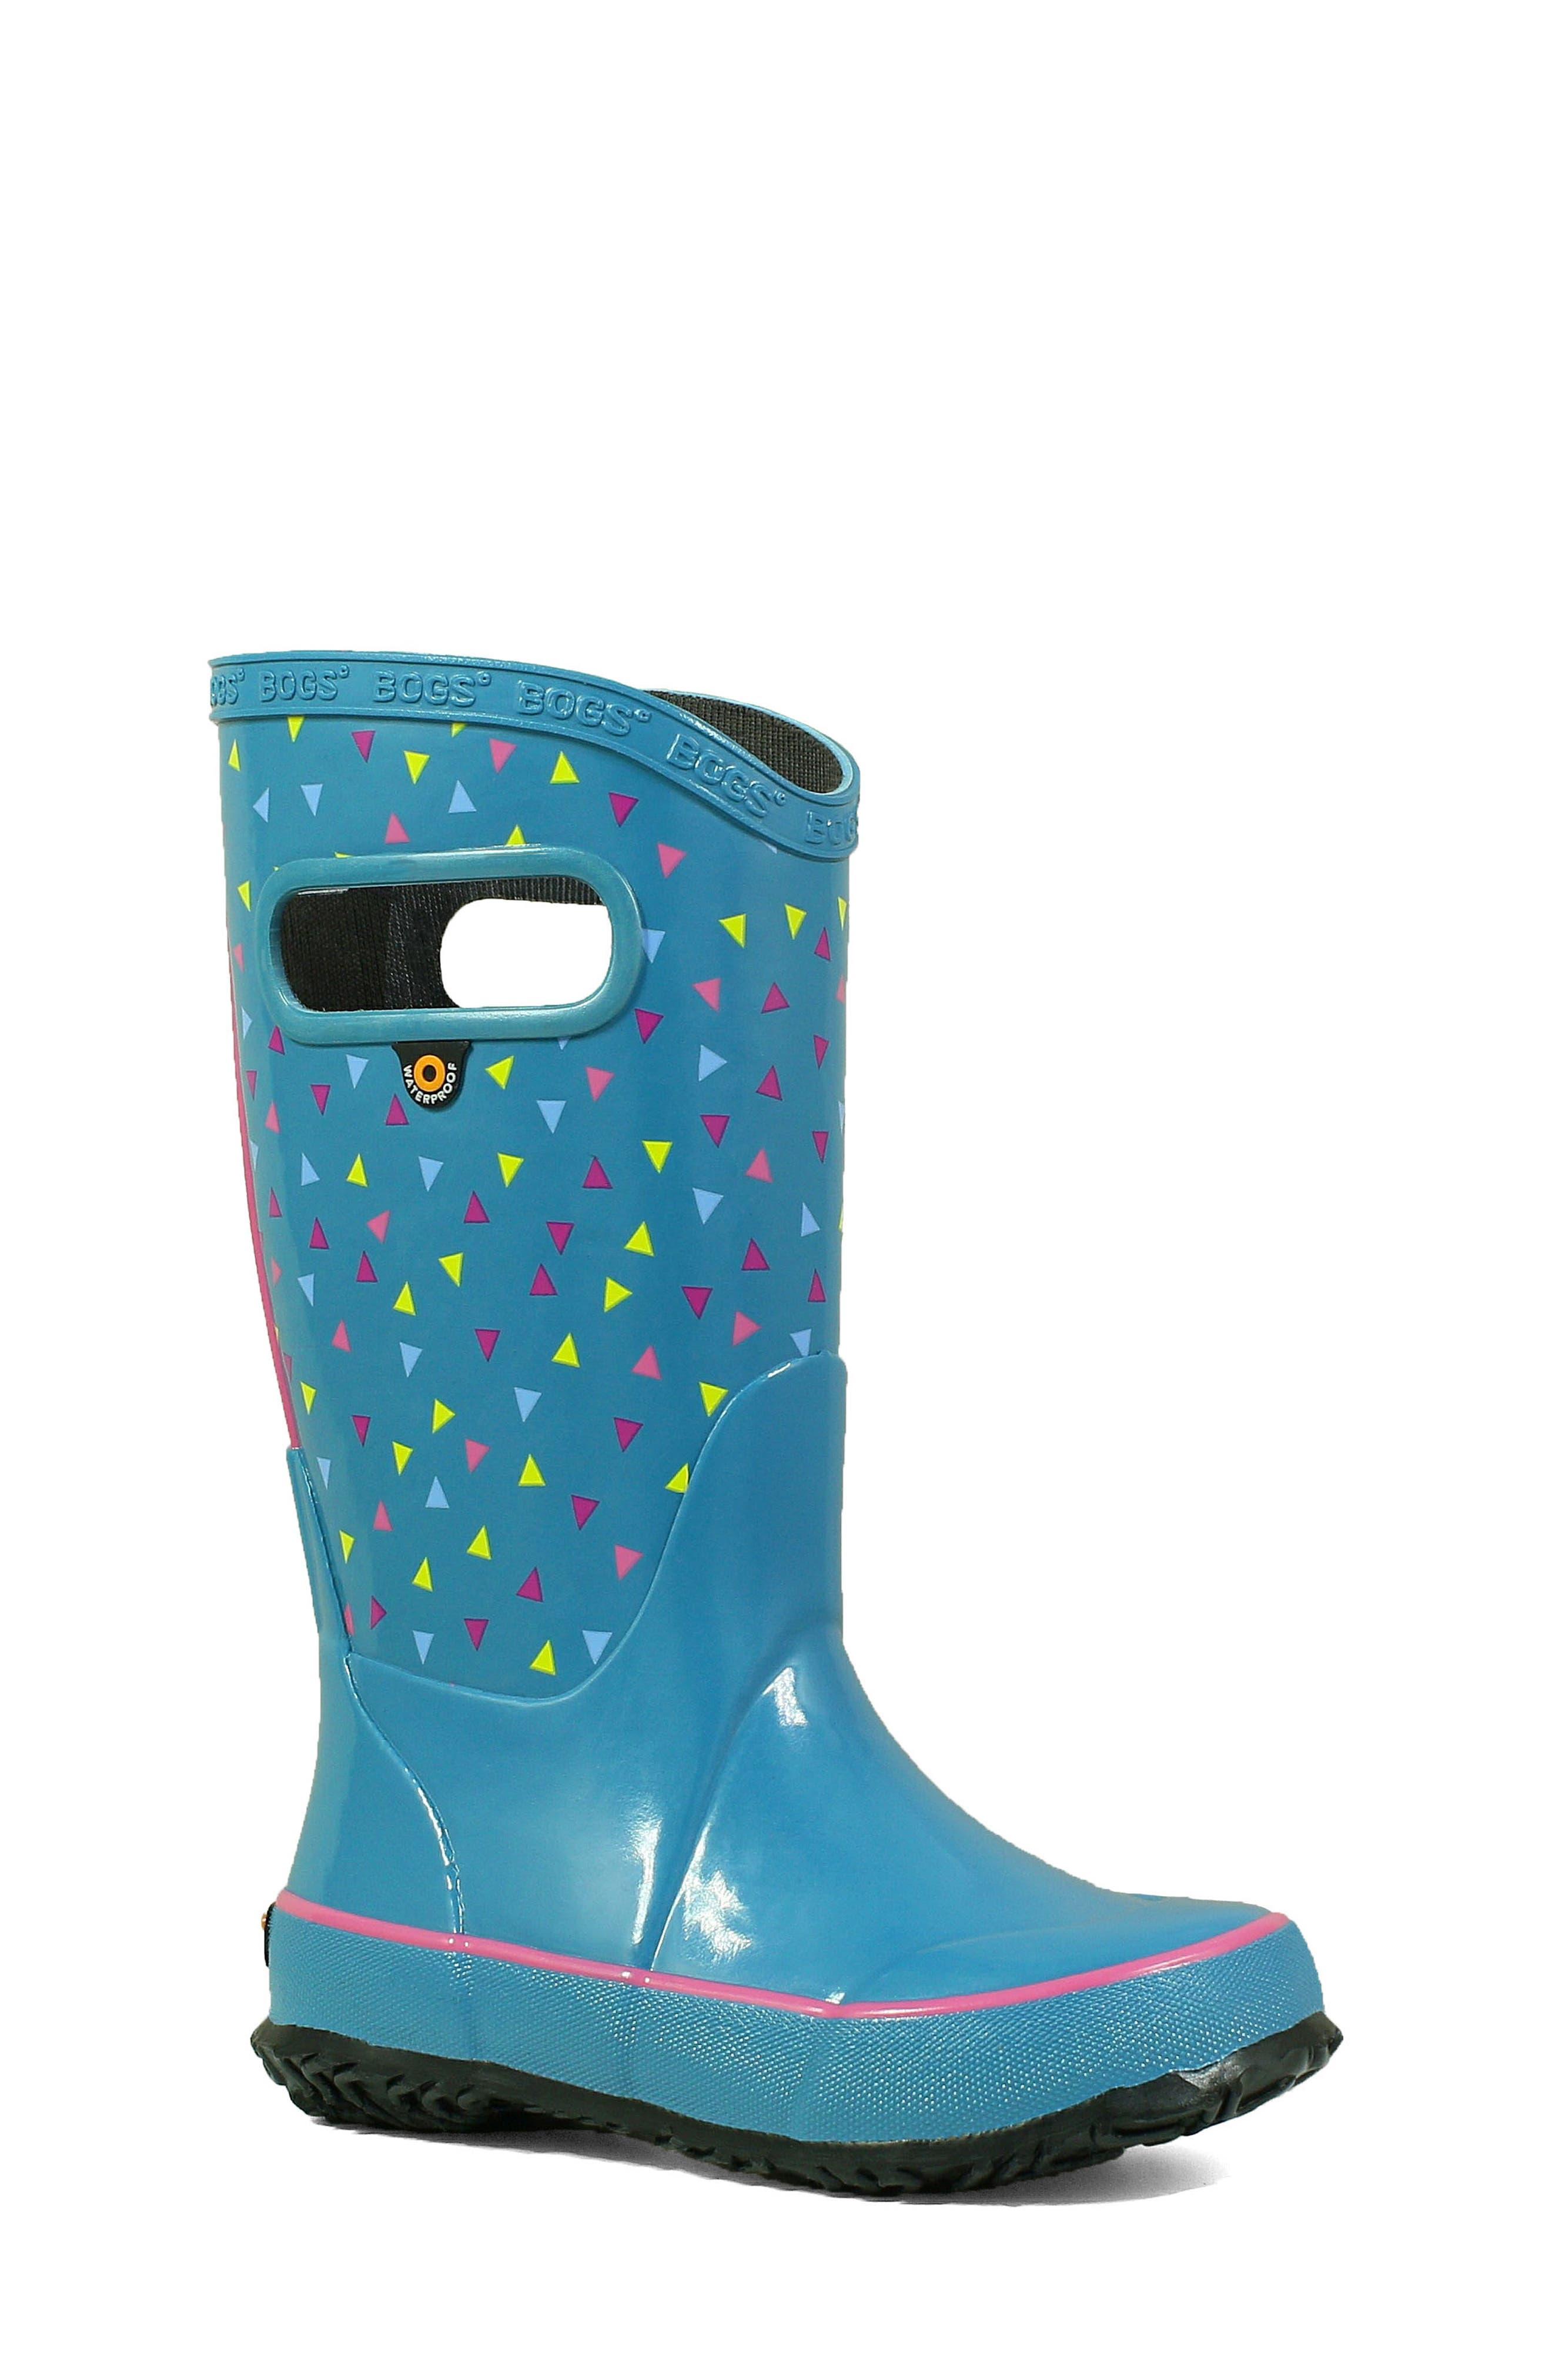 BOGS, Dots Waterproof Rain Boot, Main thumbnail 1, color, DARK BLUE MULTI